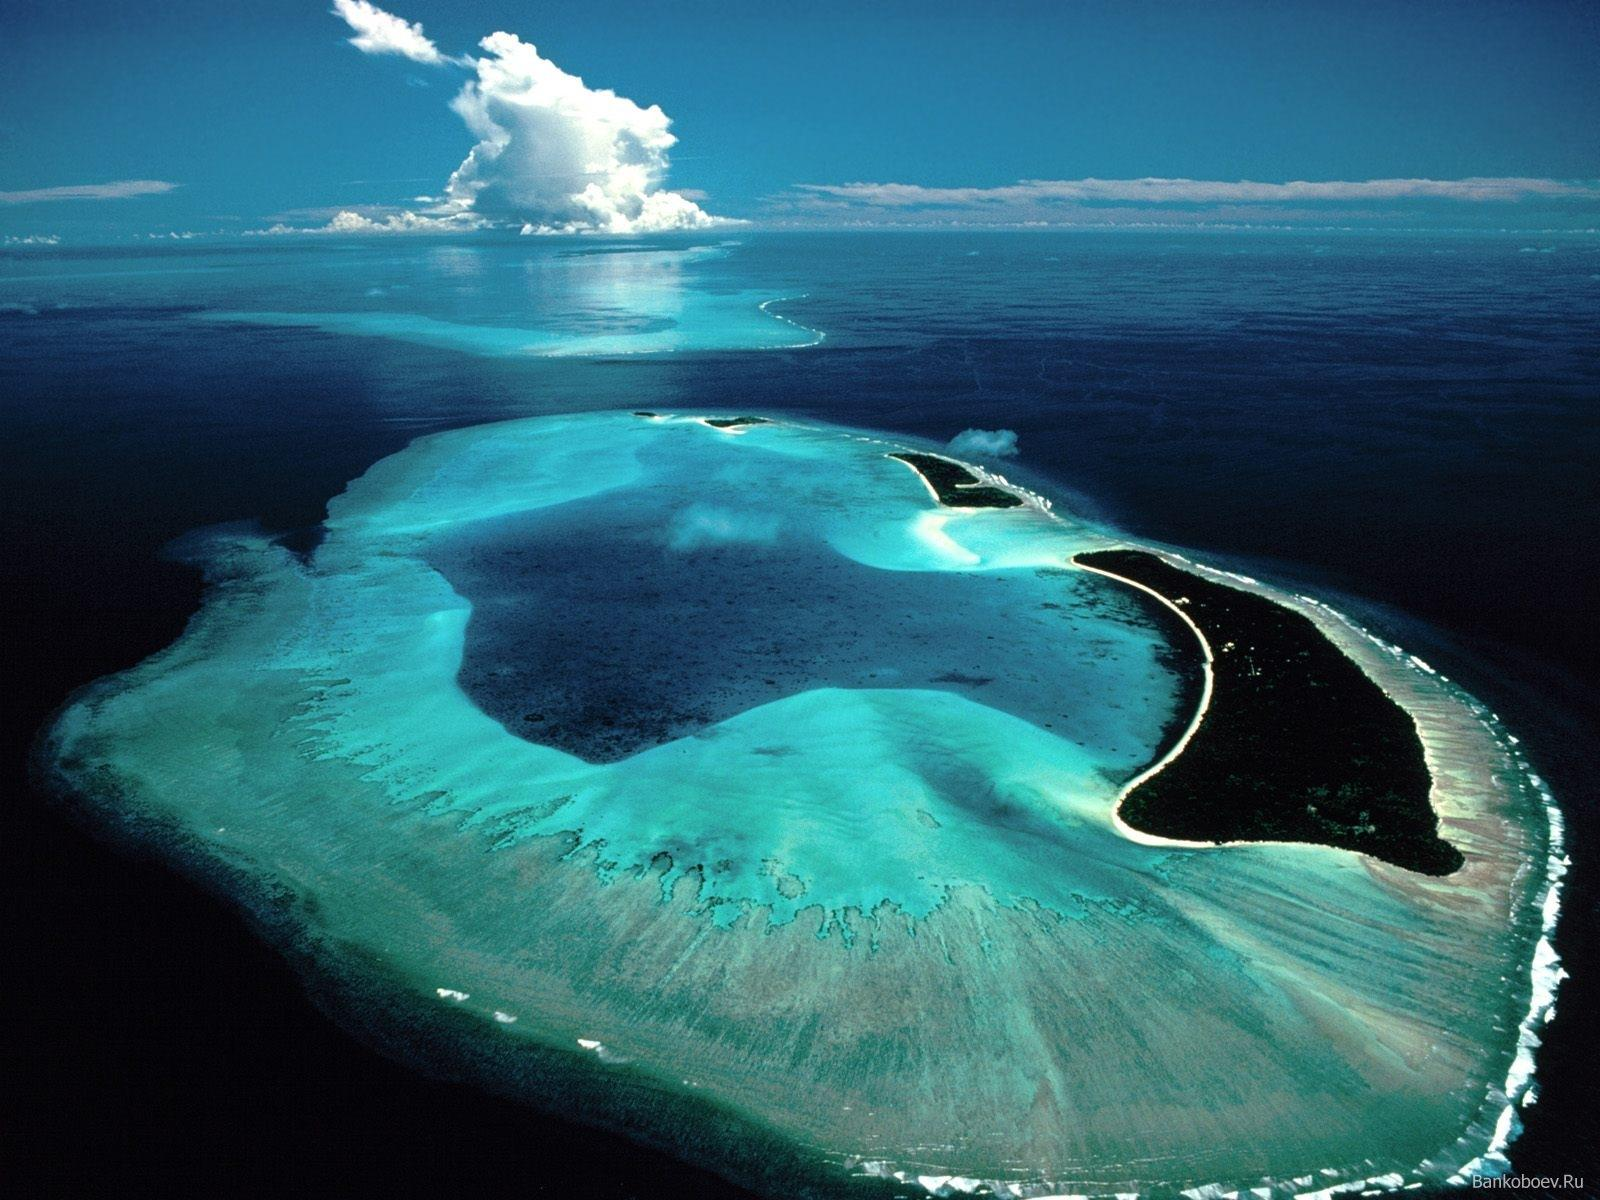 http://1.bp.blogspot.com/-Ll7zptrFvTo/TmQUrktBqBI/AAAAAAAAE74/6PA06EyXT_Y/s1600/Beautiful+islands+wallpapers+3.jpg